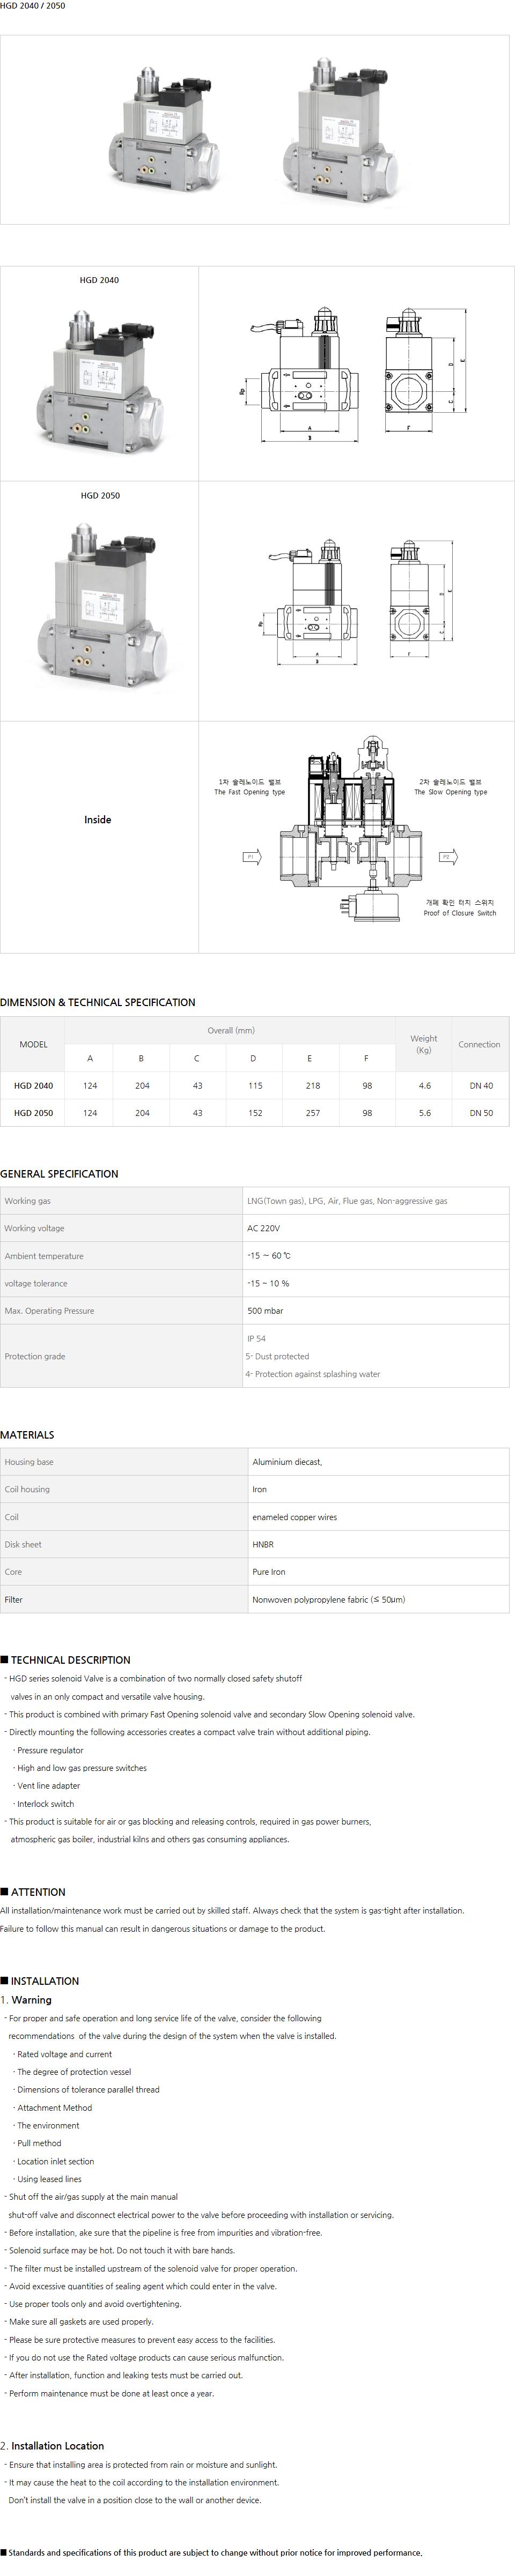 HYOSHIN MECHATRONICS Gas Dual Solenoid Valve HGD 2040/2050